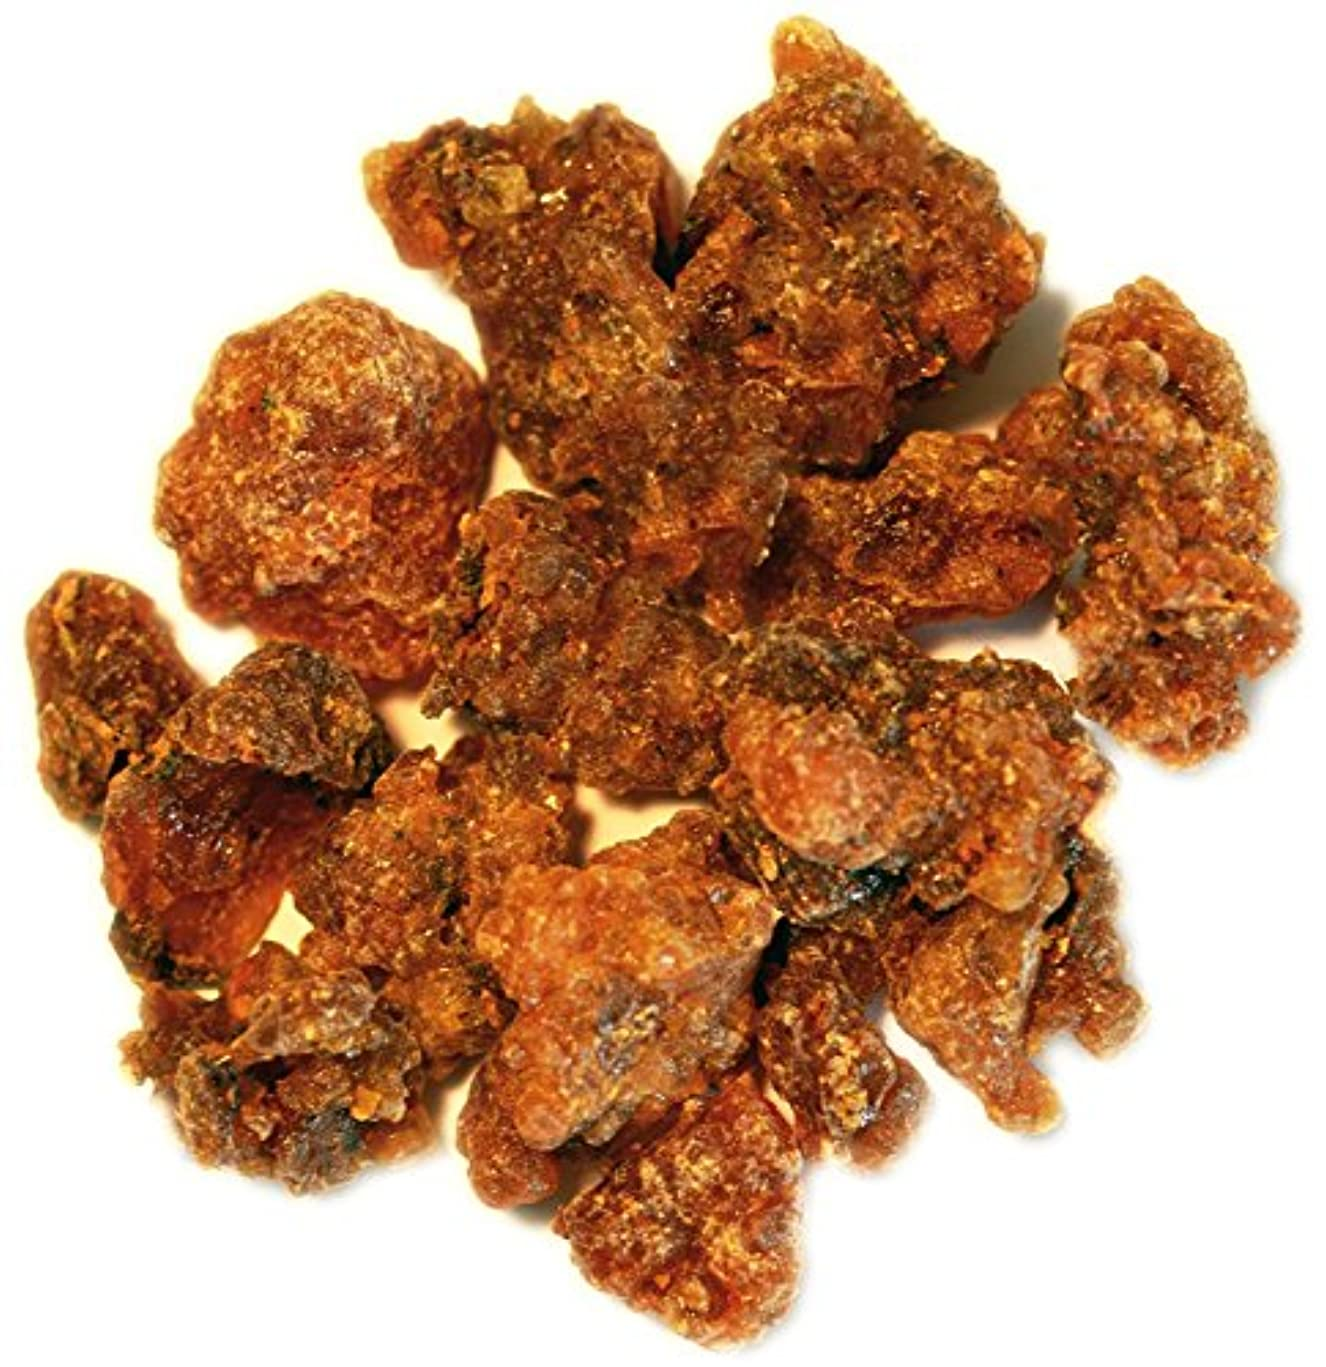 魂定規島Myrrh Resin - Organic - 0.2kg - by EarthWise Aromatics